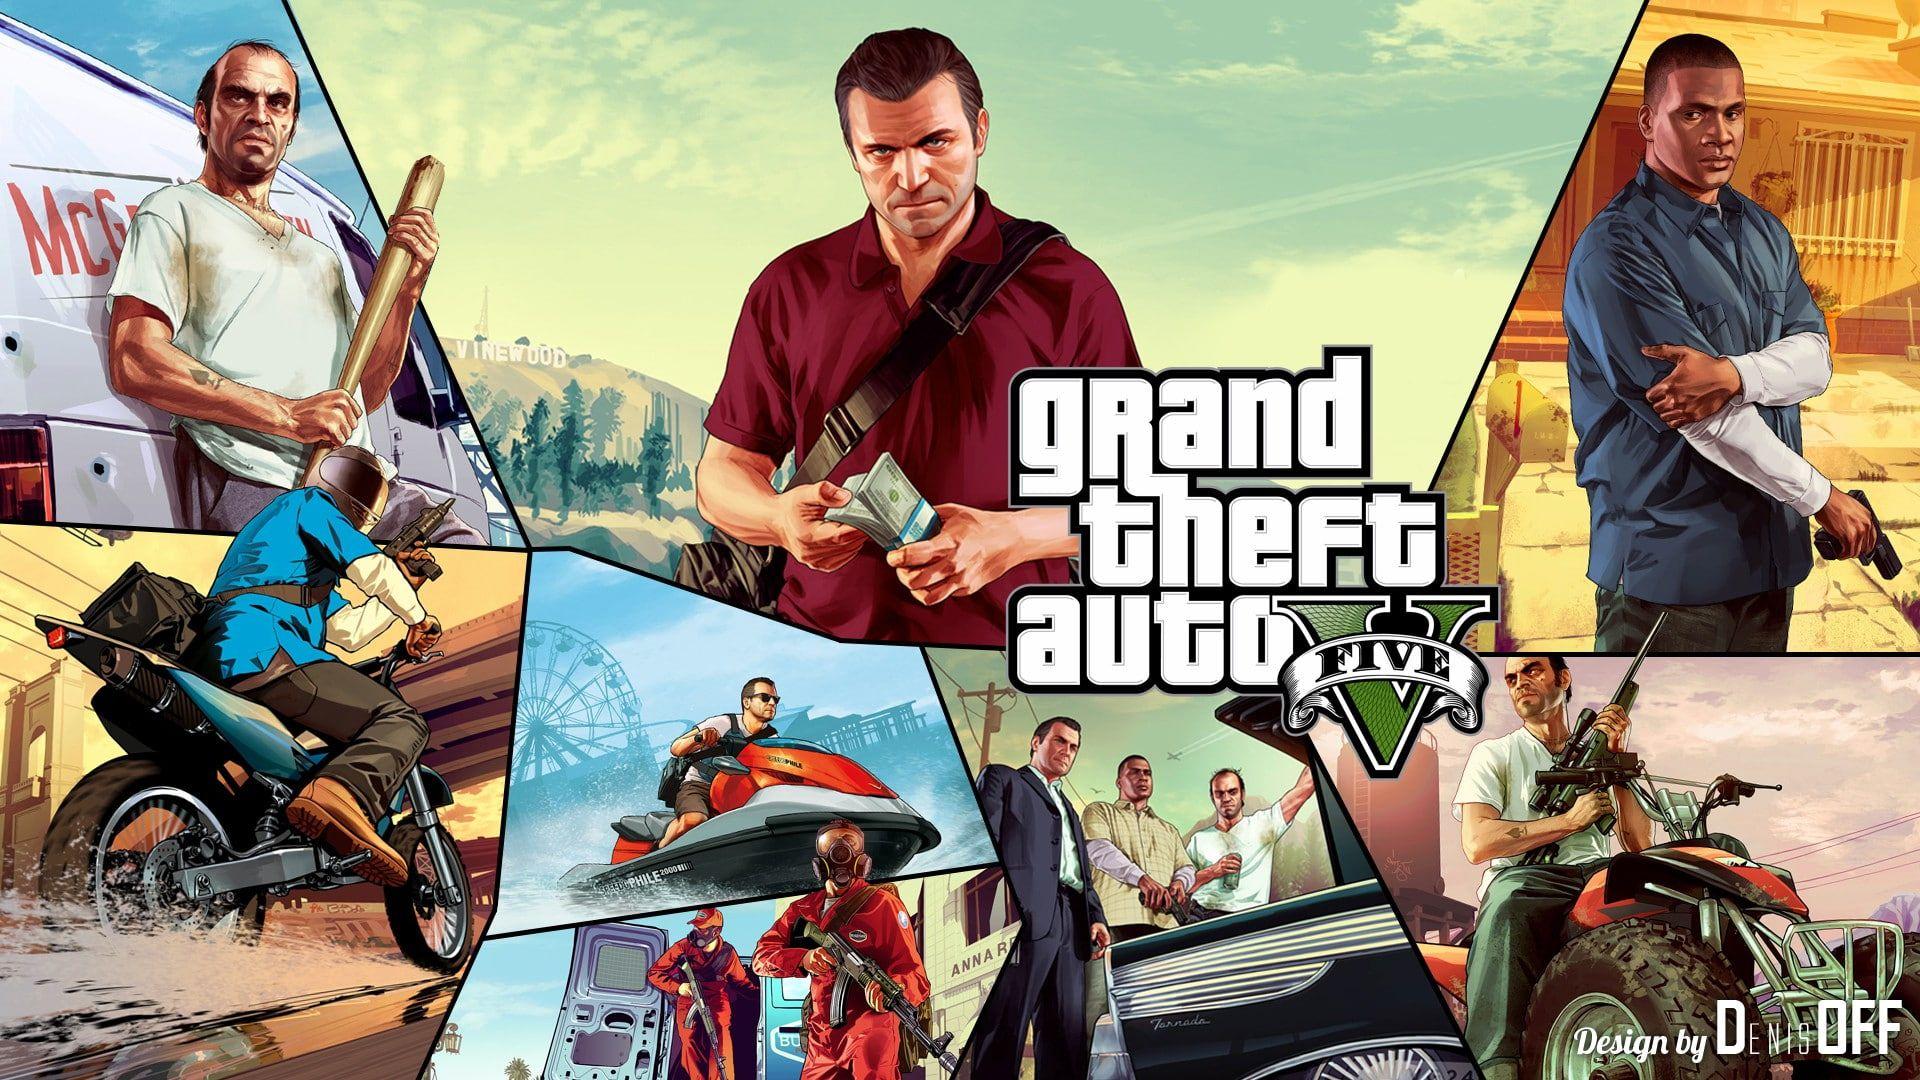 Gta 5 In Photoshop Grand Theft Auto Five Gta Gta5 Gtav V Photoshop Denisoff 1080p Wallpaper Hdwallpaper Desk In 2020 Grand Theft Auto Gta 5 New Wallpaper Hd